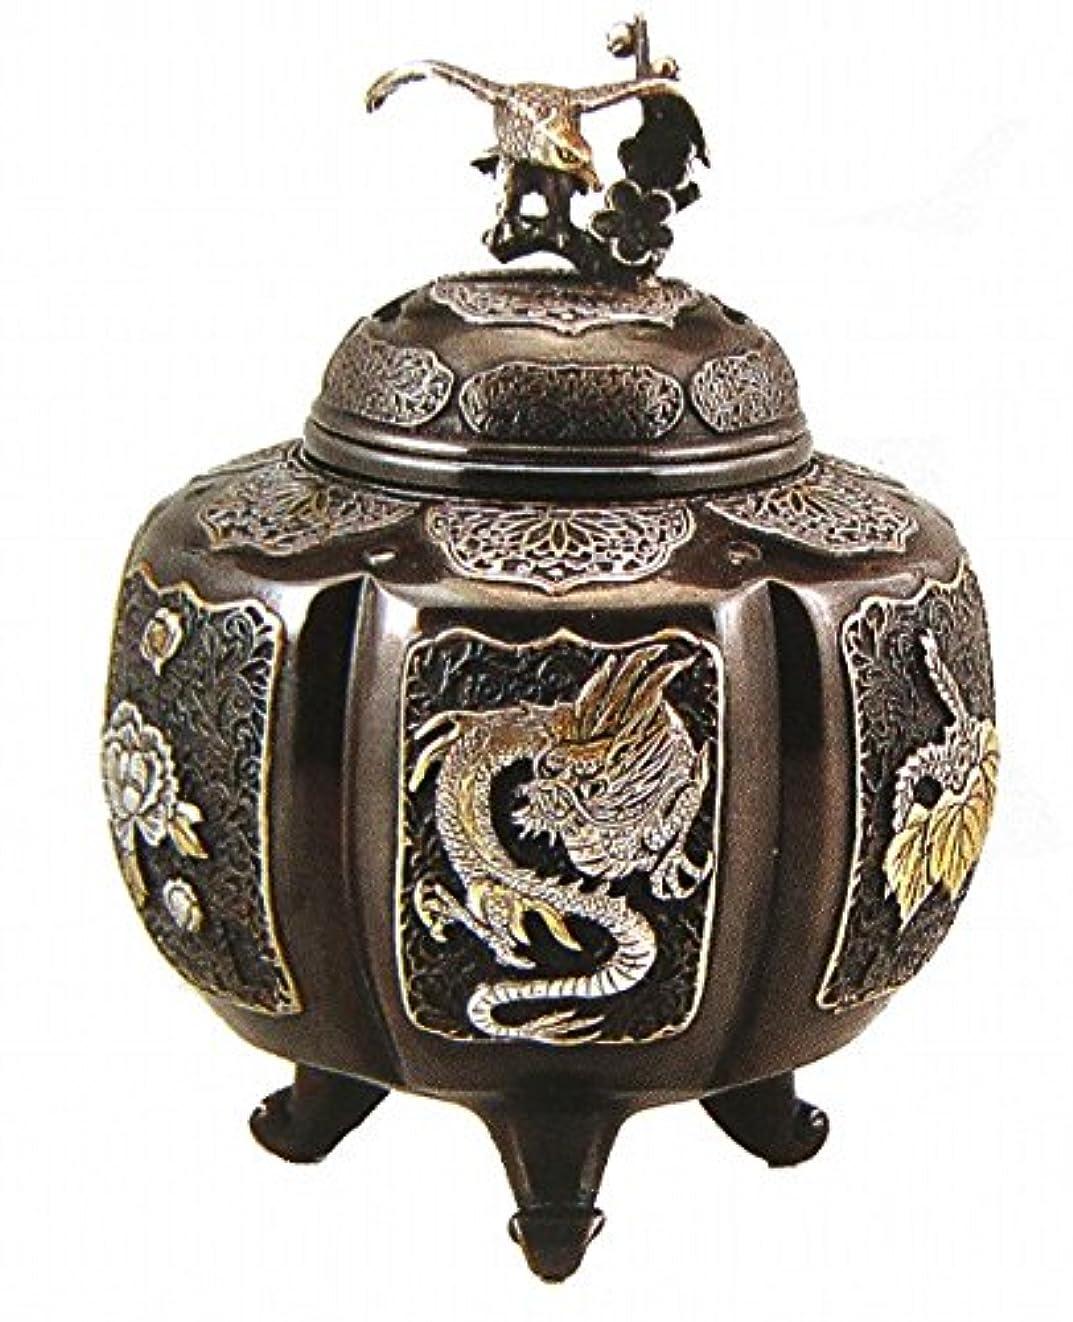 気付く単位アンデス山脈『六面吉祥地紋香炉』銅製